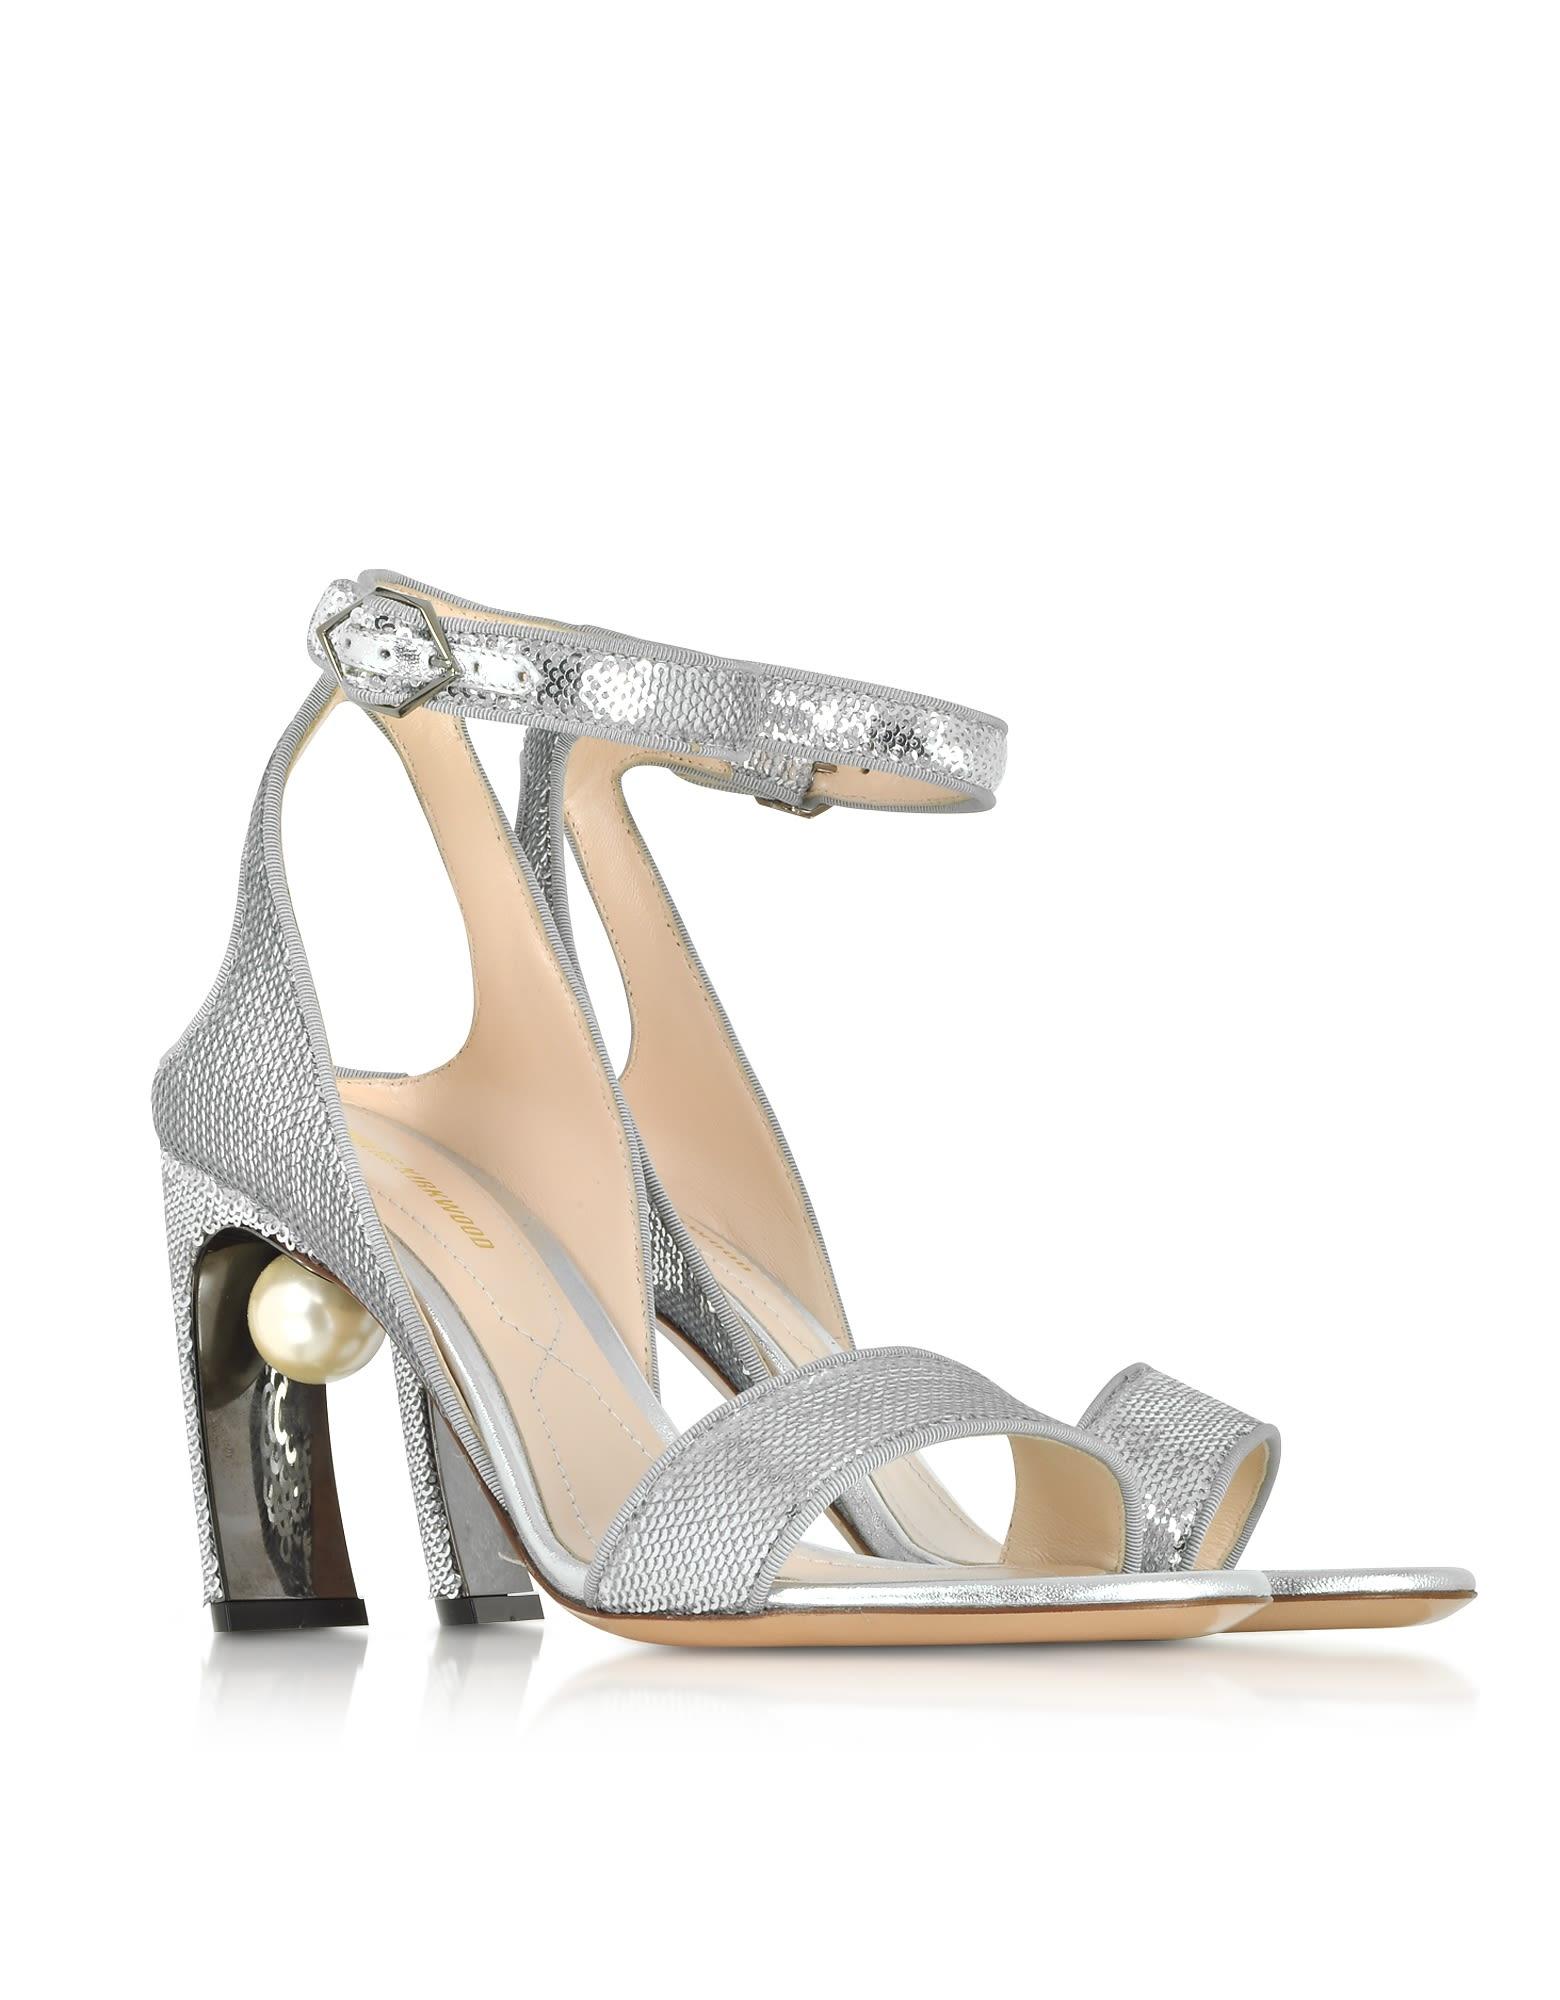 Nicholas Kirkwood Designer Shoes, Sequins 90mm Lola Pearl Sandals